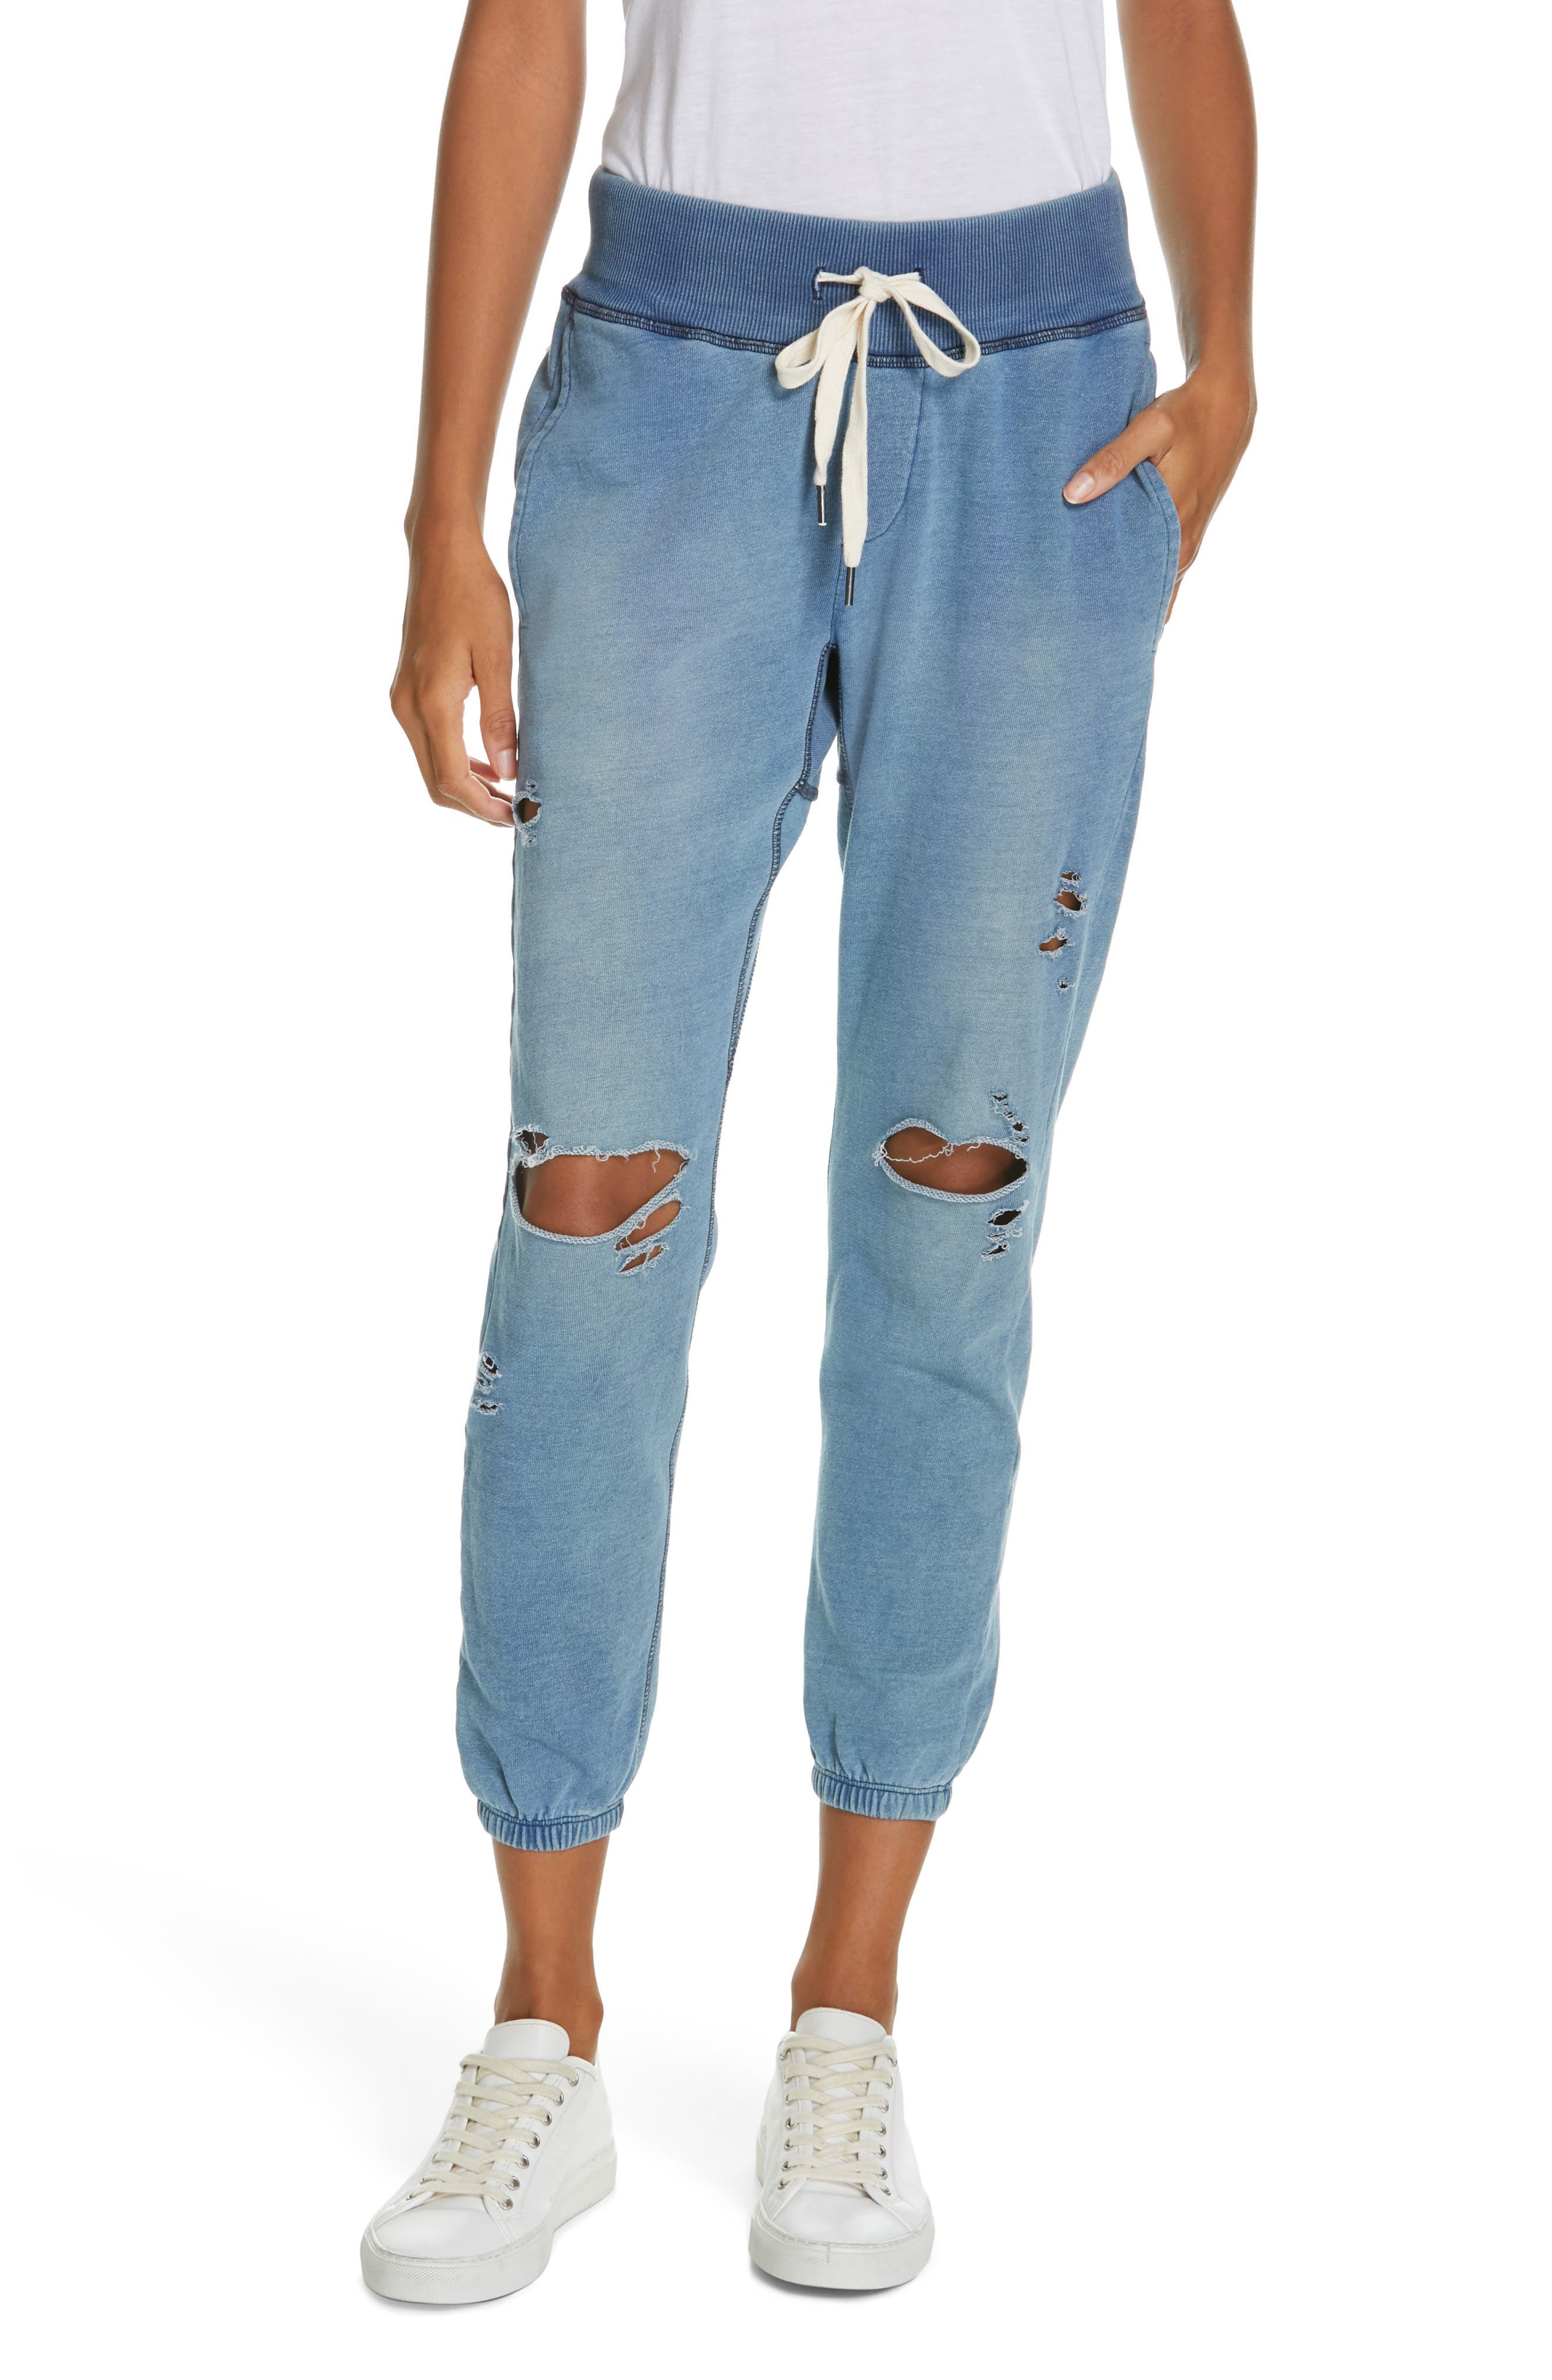 Nsf Clothing Sayde Sweatpants, Blue